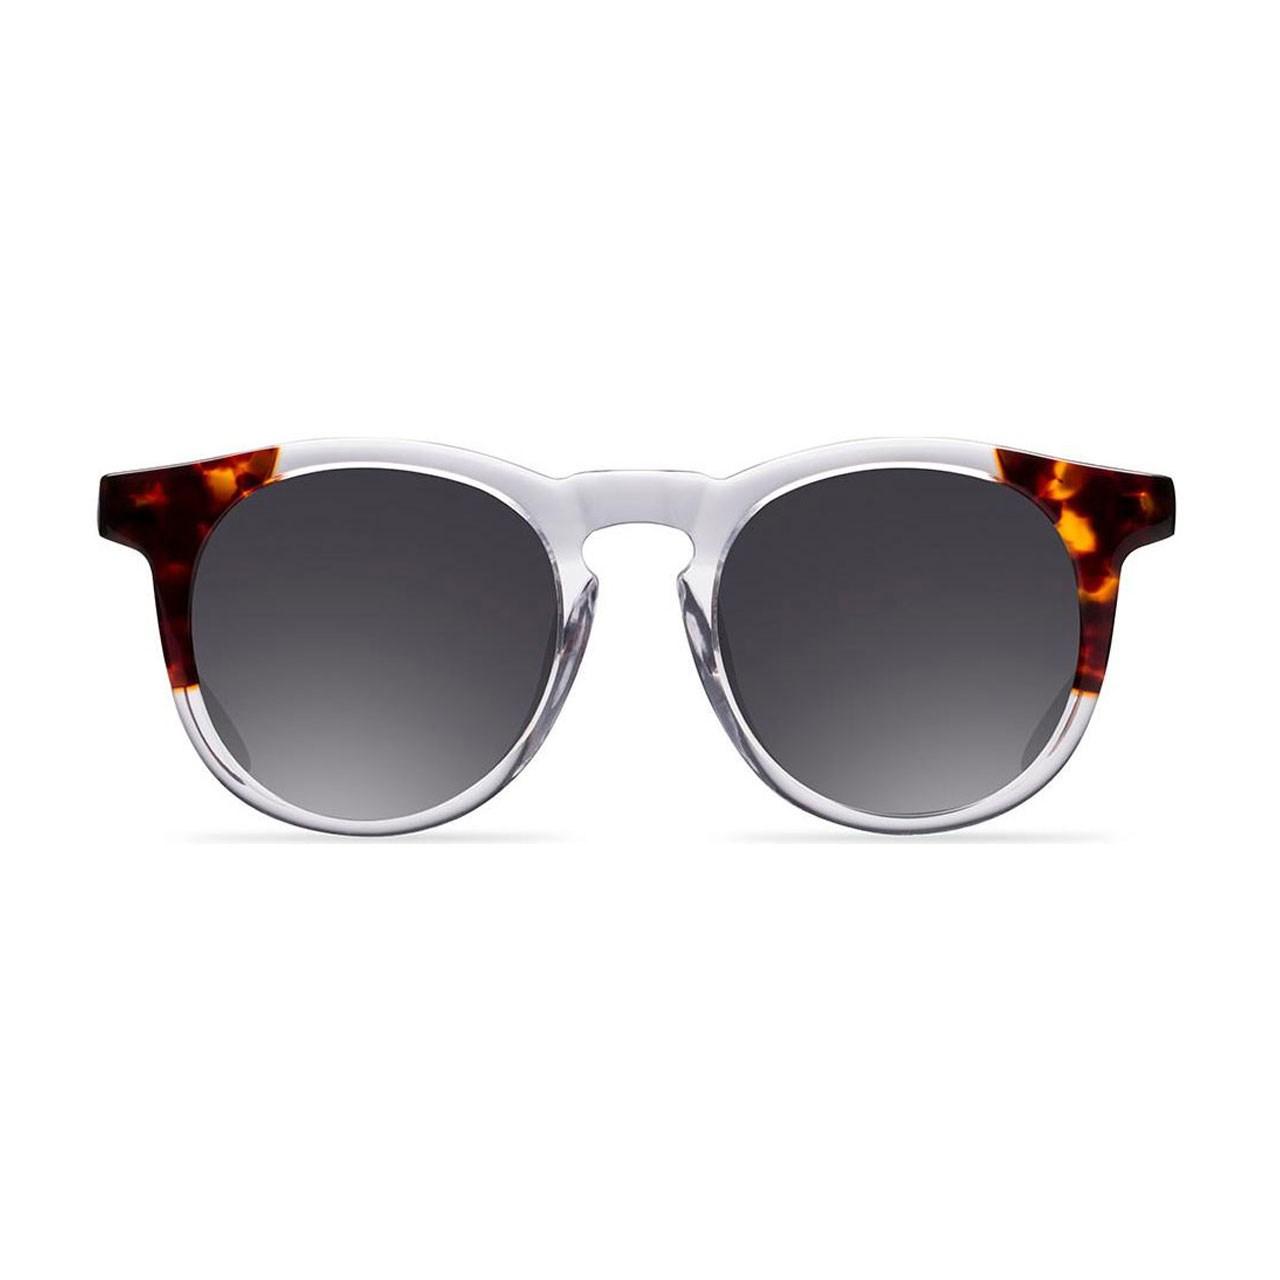 عینک آفتابی ولف نویر مدل Wolfnoir Hathi Ace